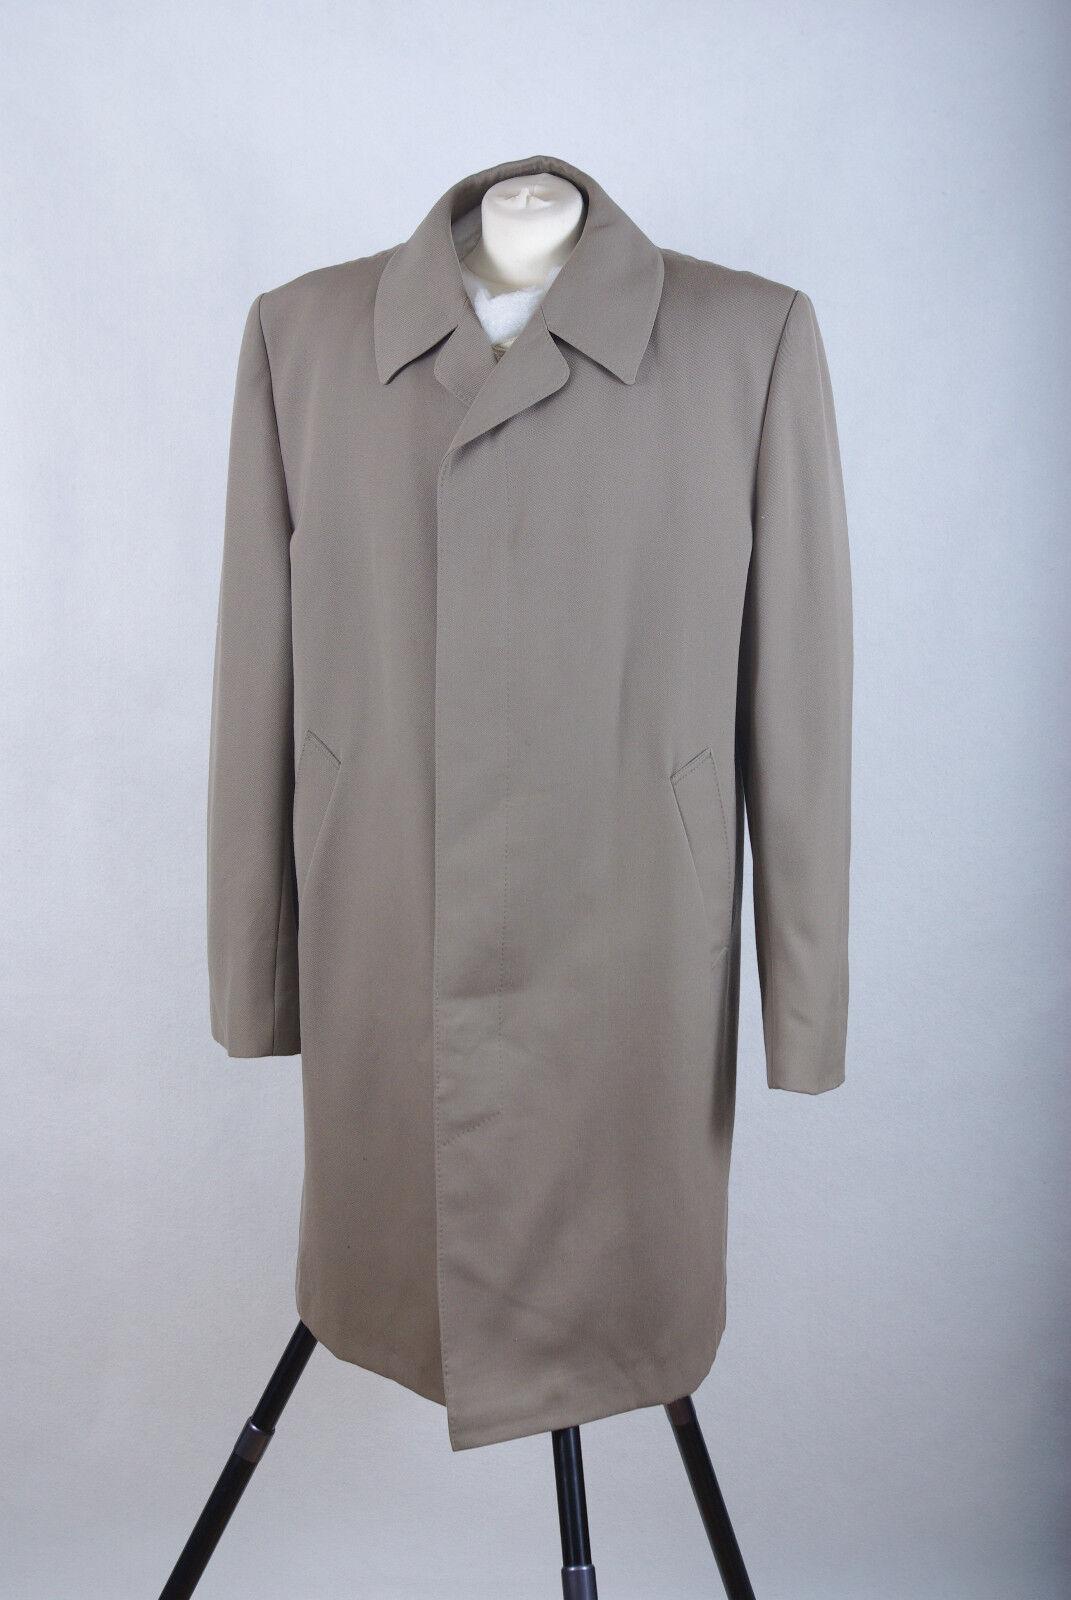 P1378/P04 Truly Vintage Trevira Wool Blend Fibre Grünish Coat, Größe XL 46 in